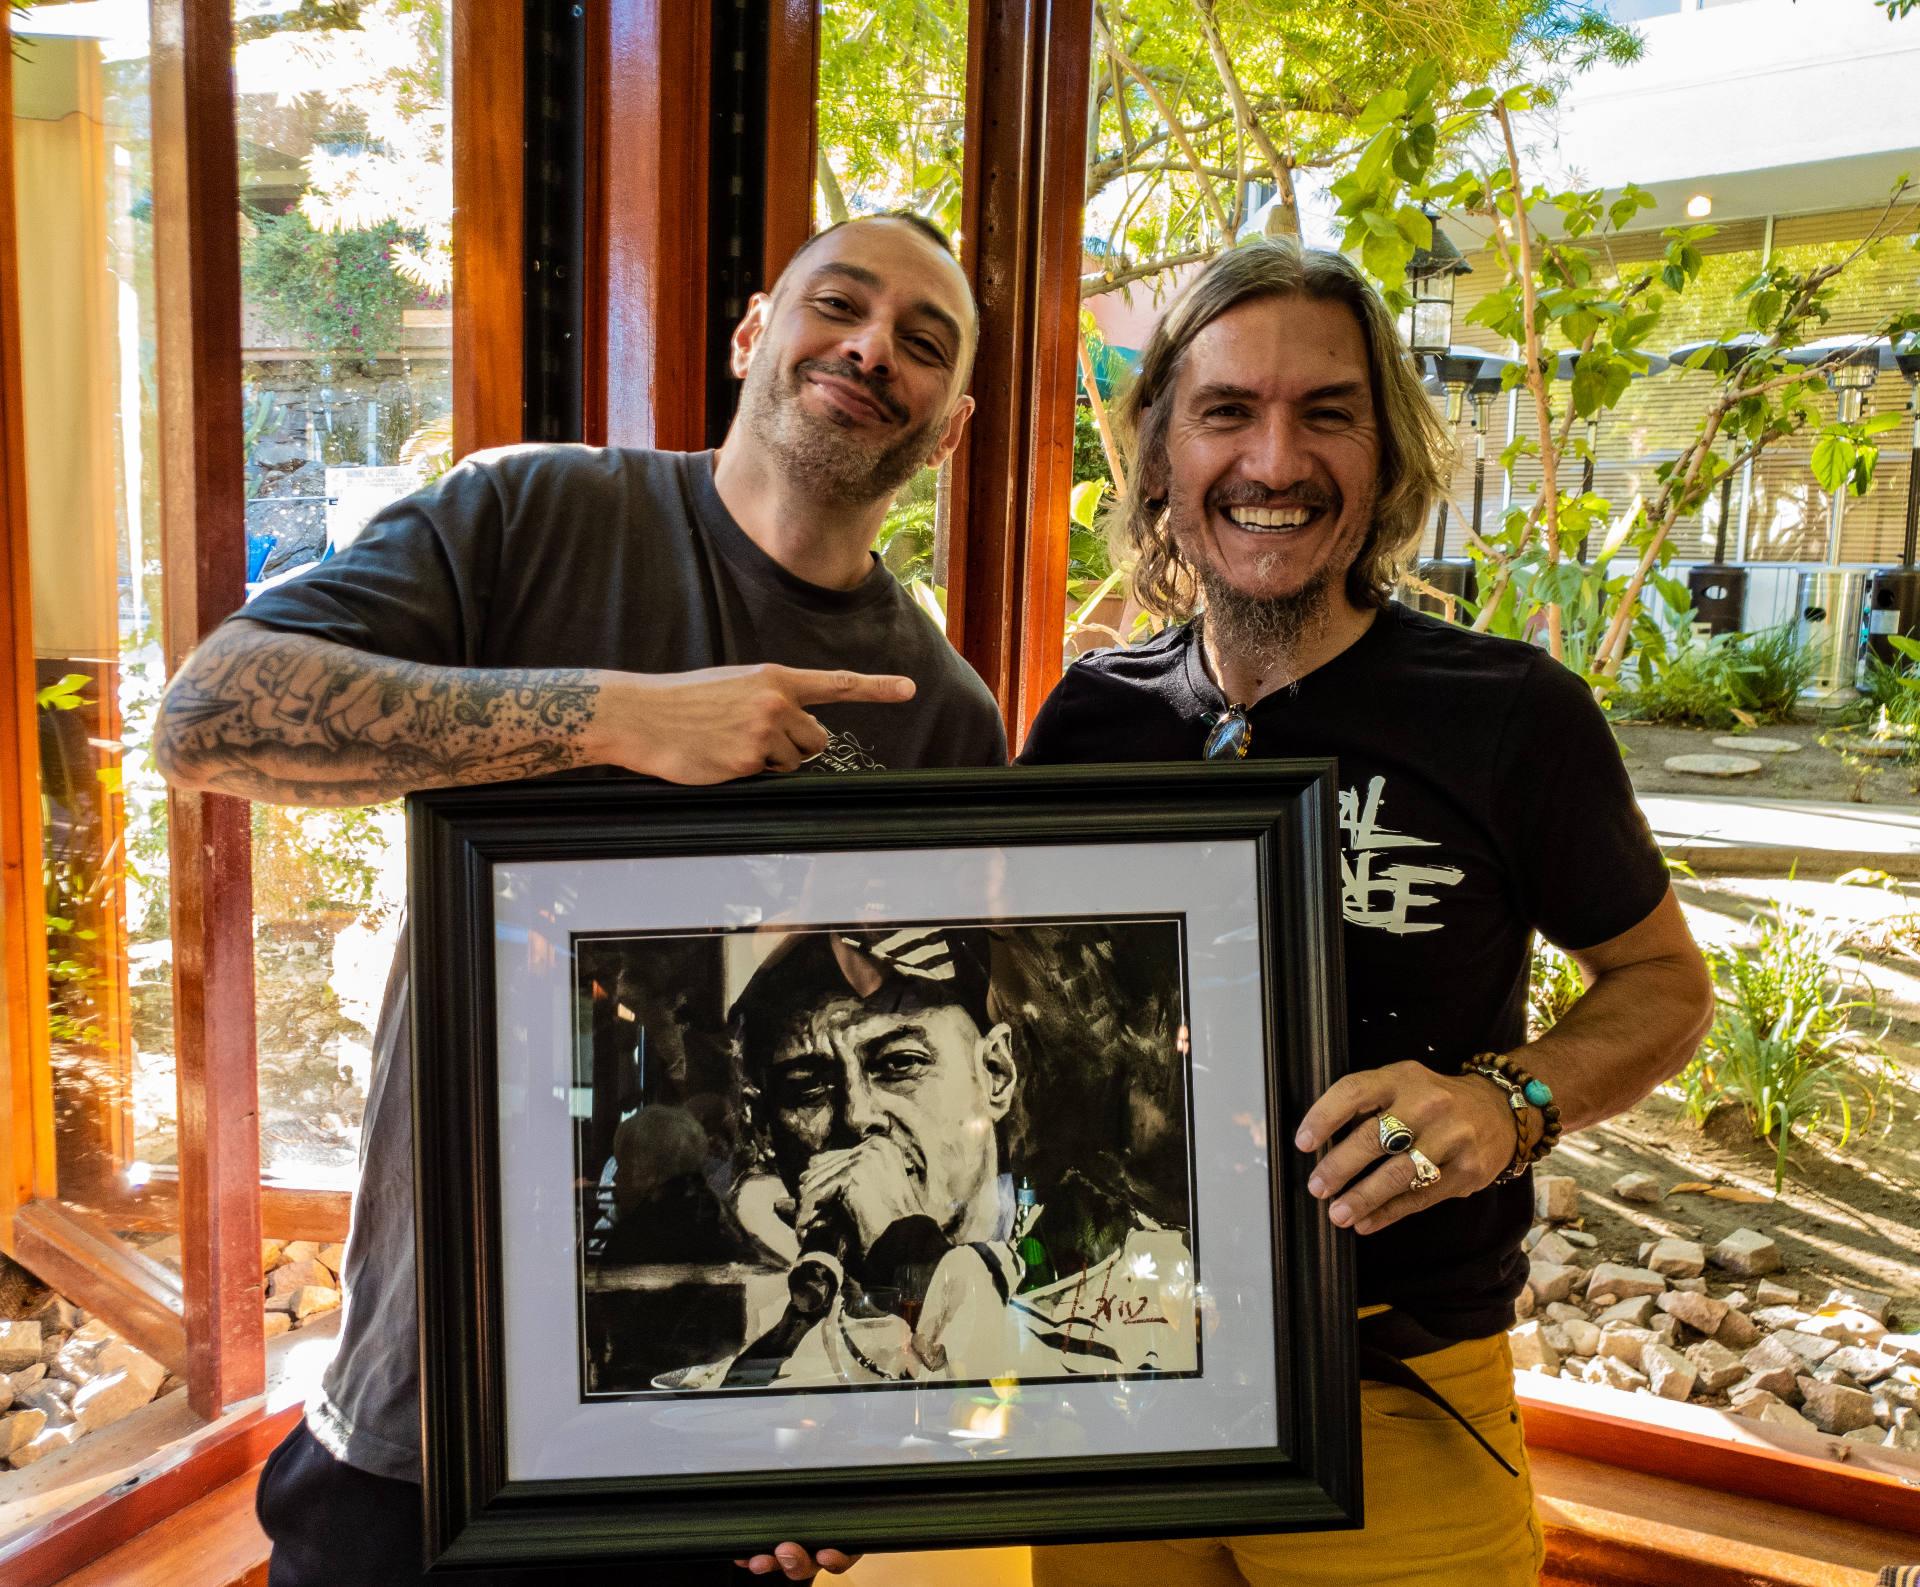 Fabri Fibra standing next to Fabian Perez holding portrait